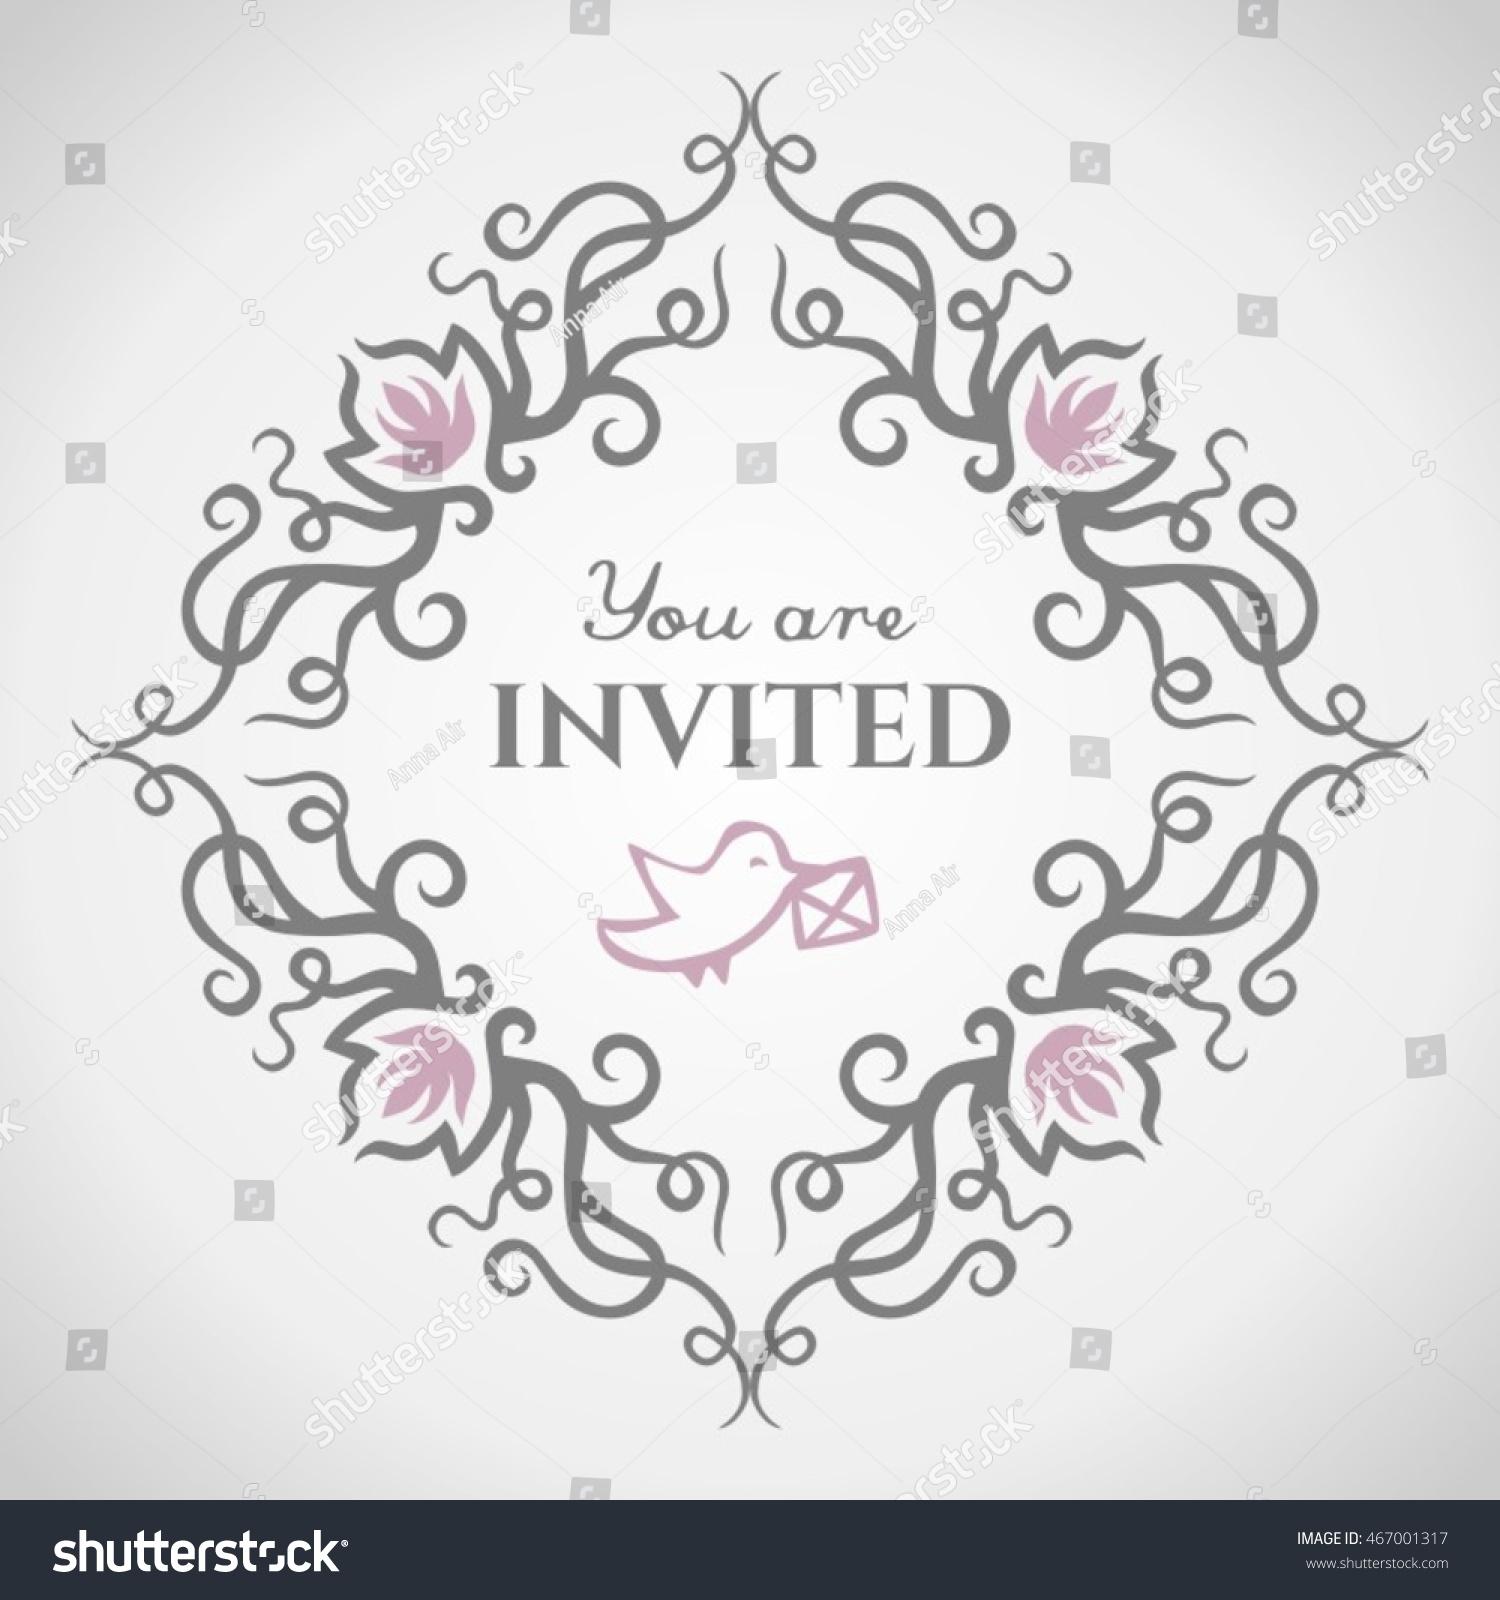 You Invited Sweet Nice Light Grey Stock Vector 467001317 - Shutterstock